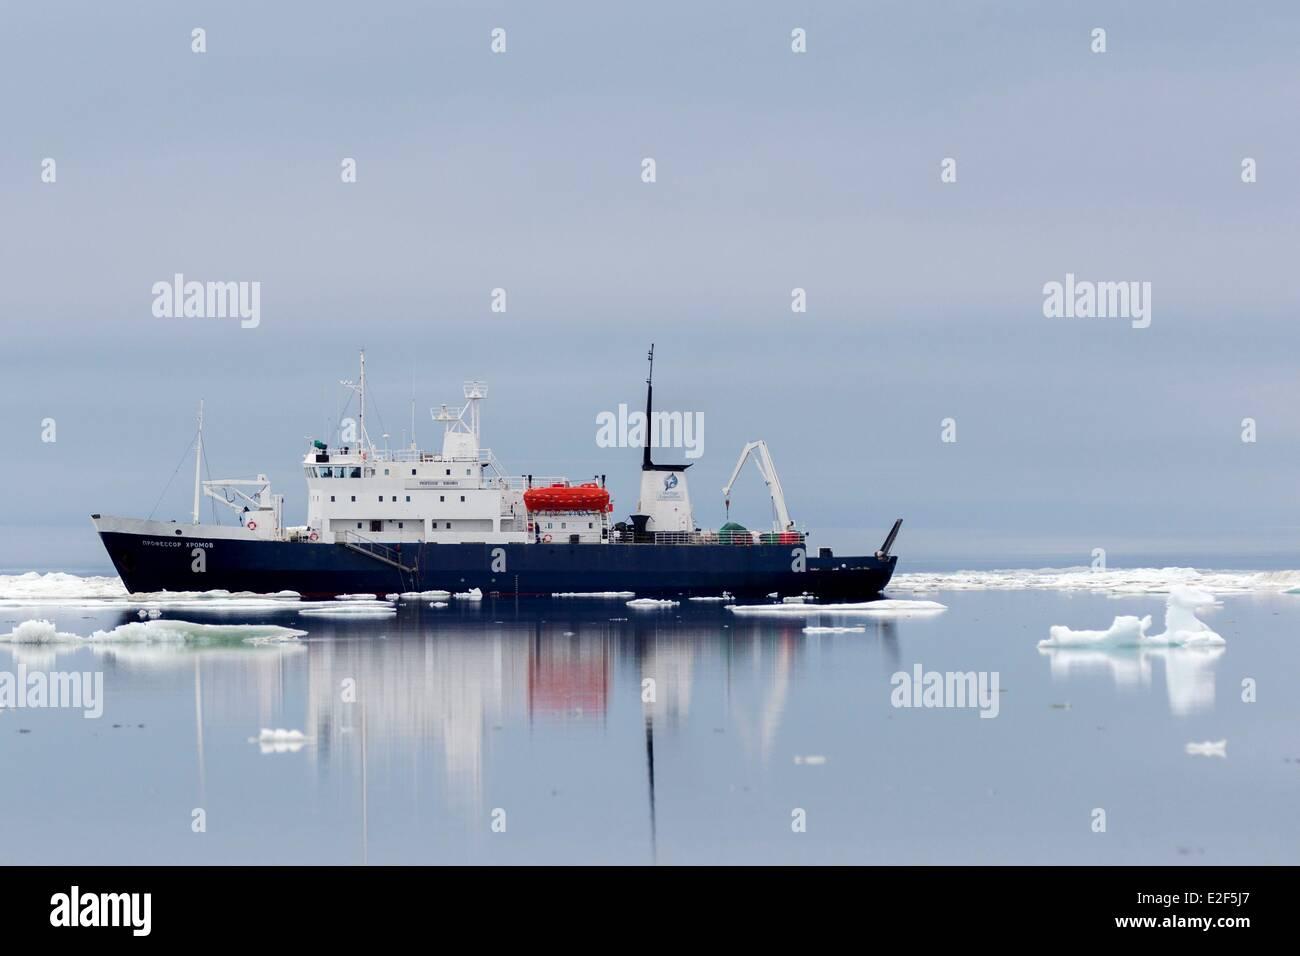 Russia, Chukotka autonomous district, Wrangel island, Pack ice, Spirit of Enderby, Professor Khromov Stock Photo